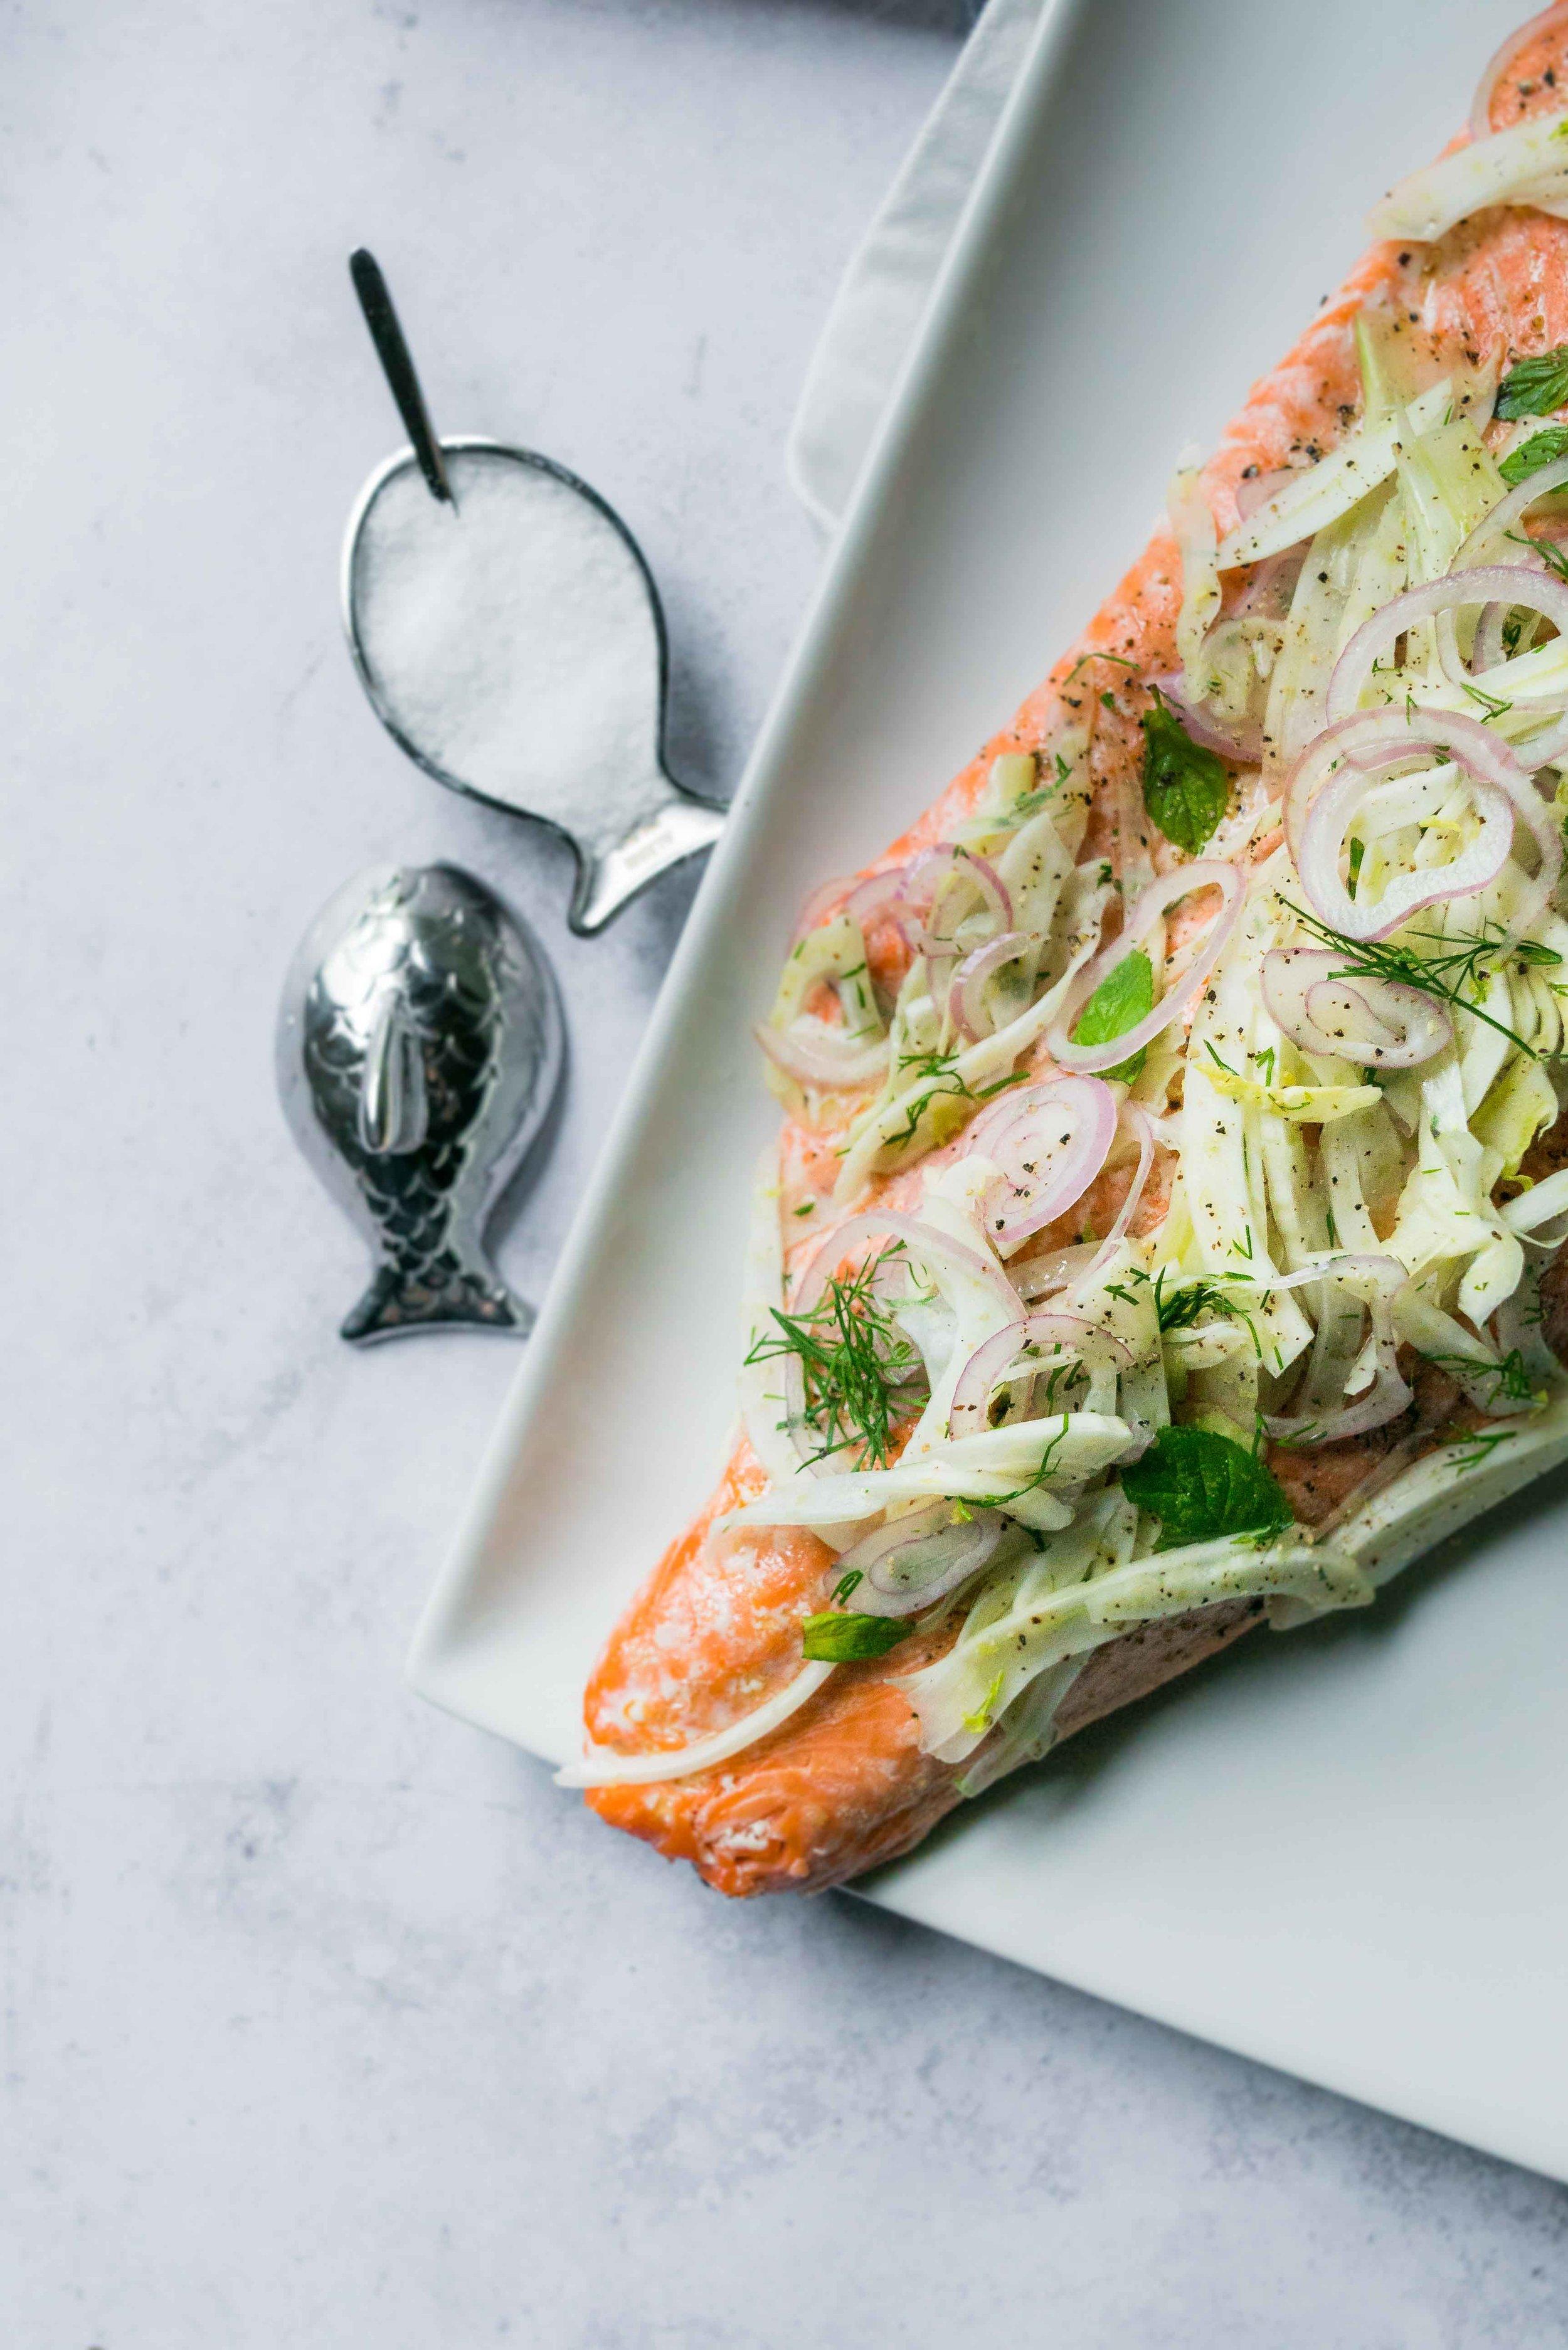 Shaved Fennel Herb Salad over Salmon